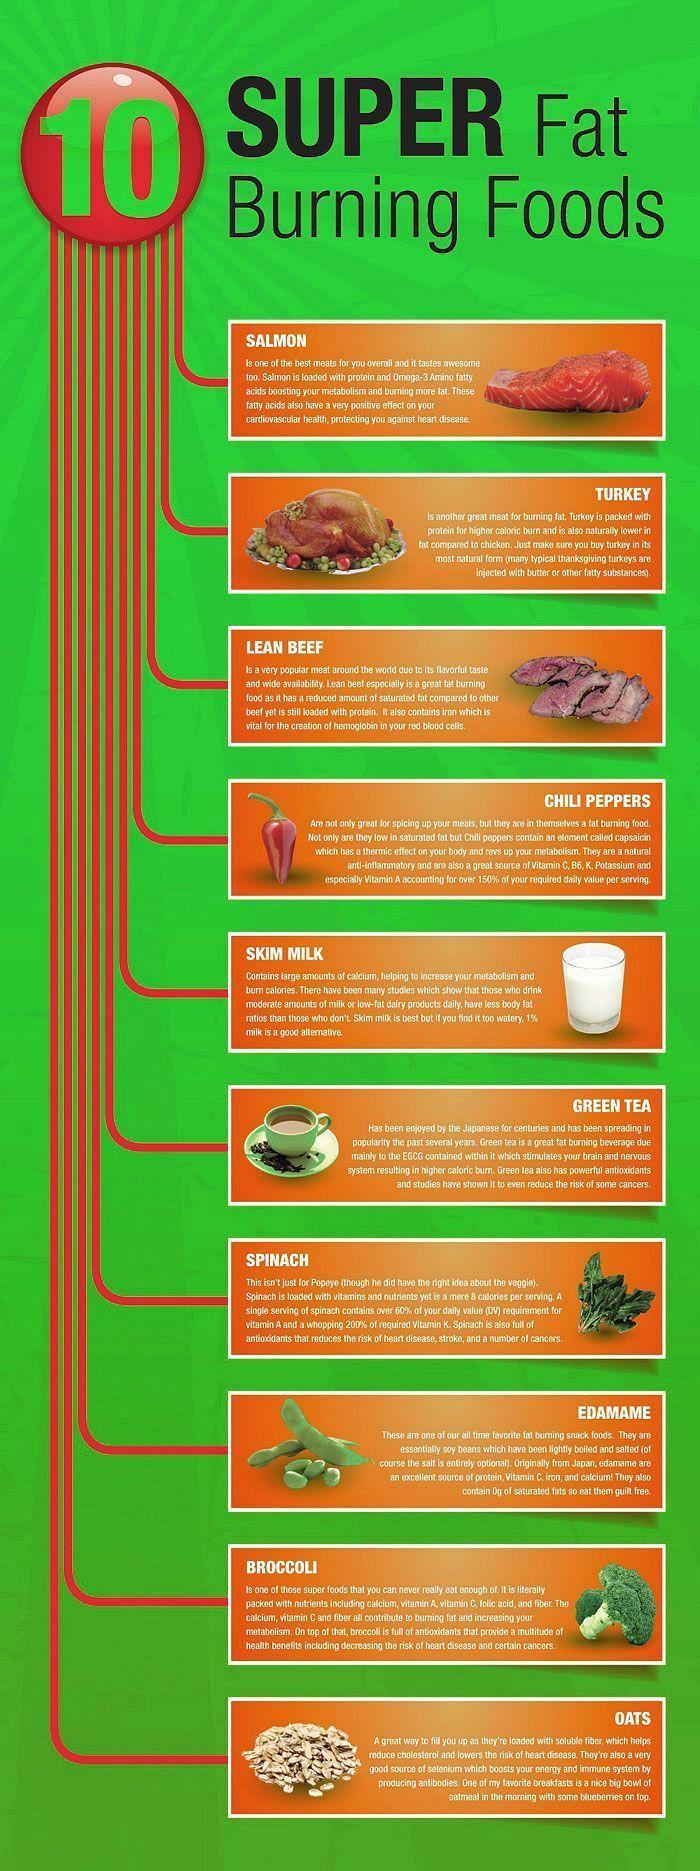 Best foods to help you burn fat.10 super fat burning foods